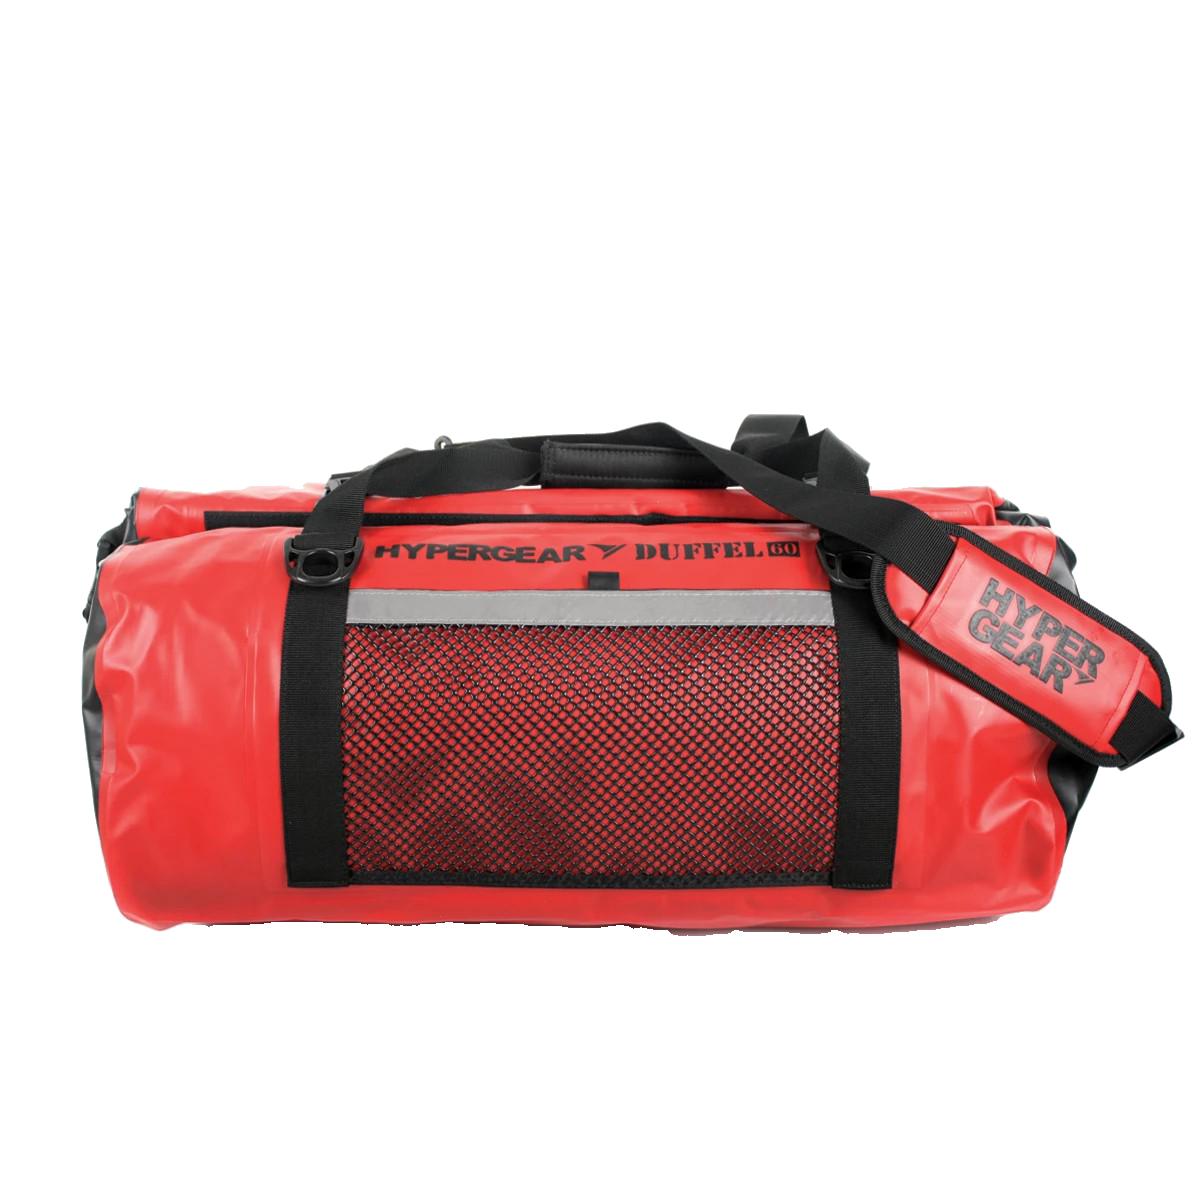 77 HYPERGEAR DUFFEL BAG 60L RED.png